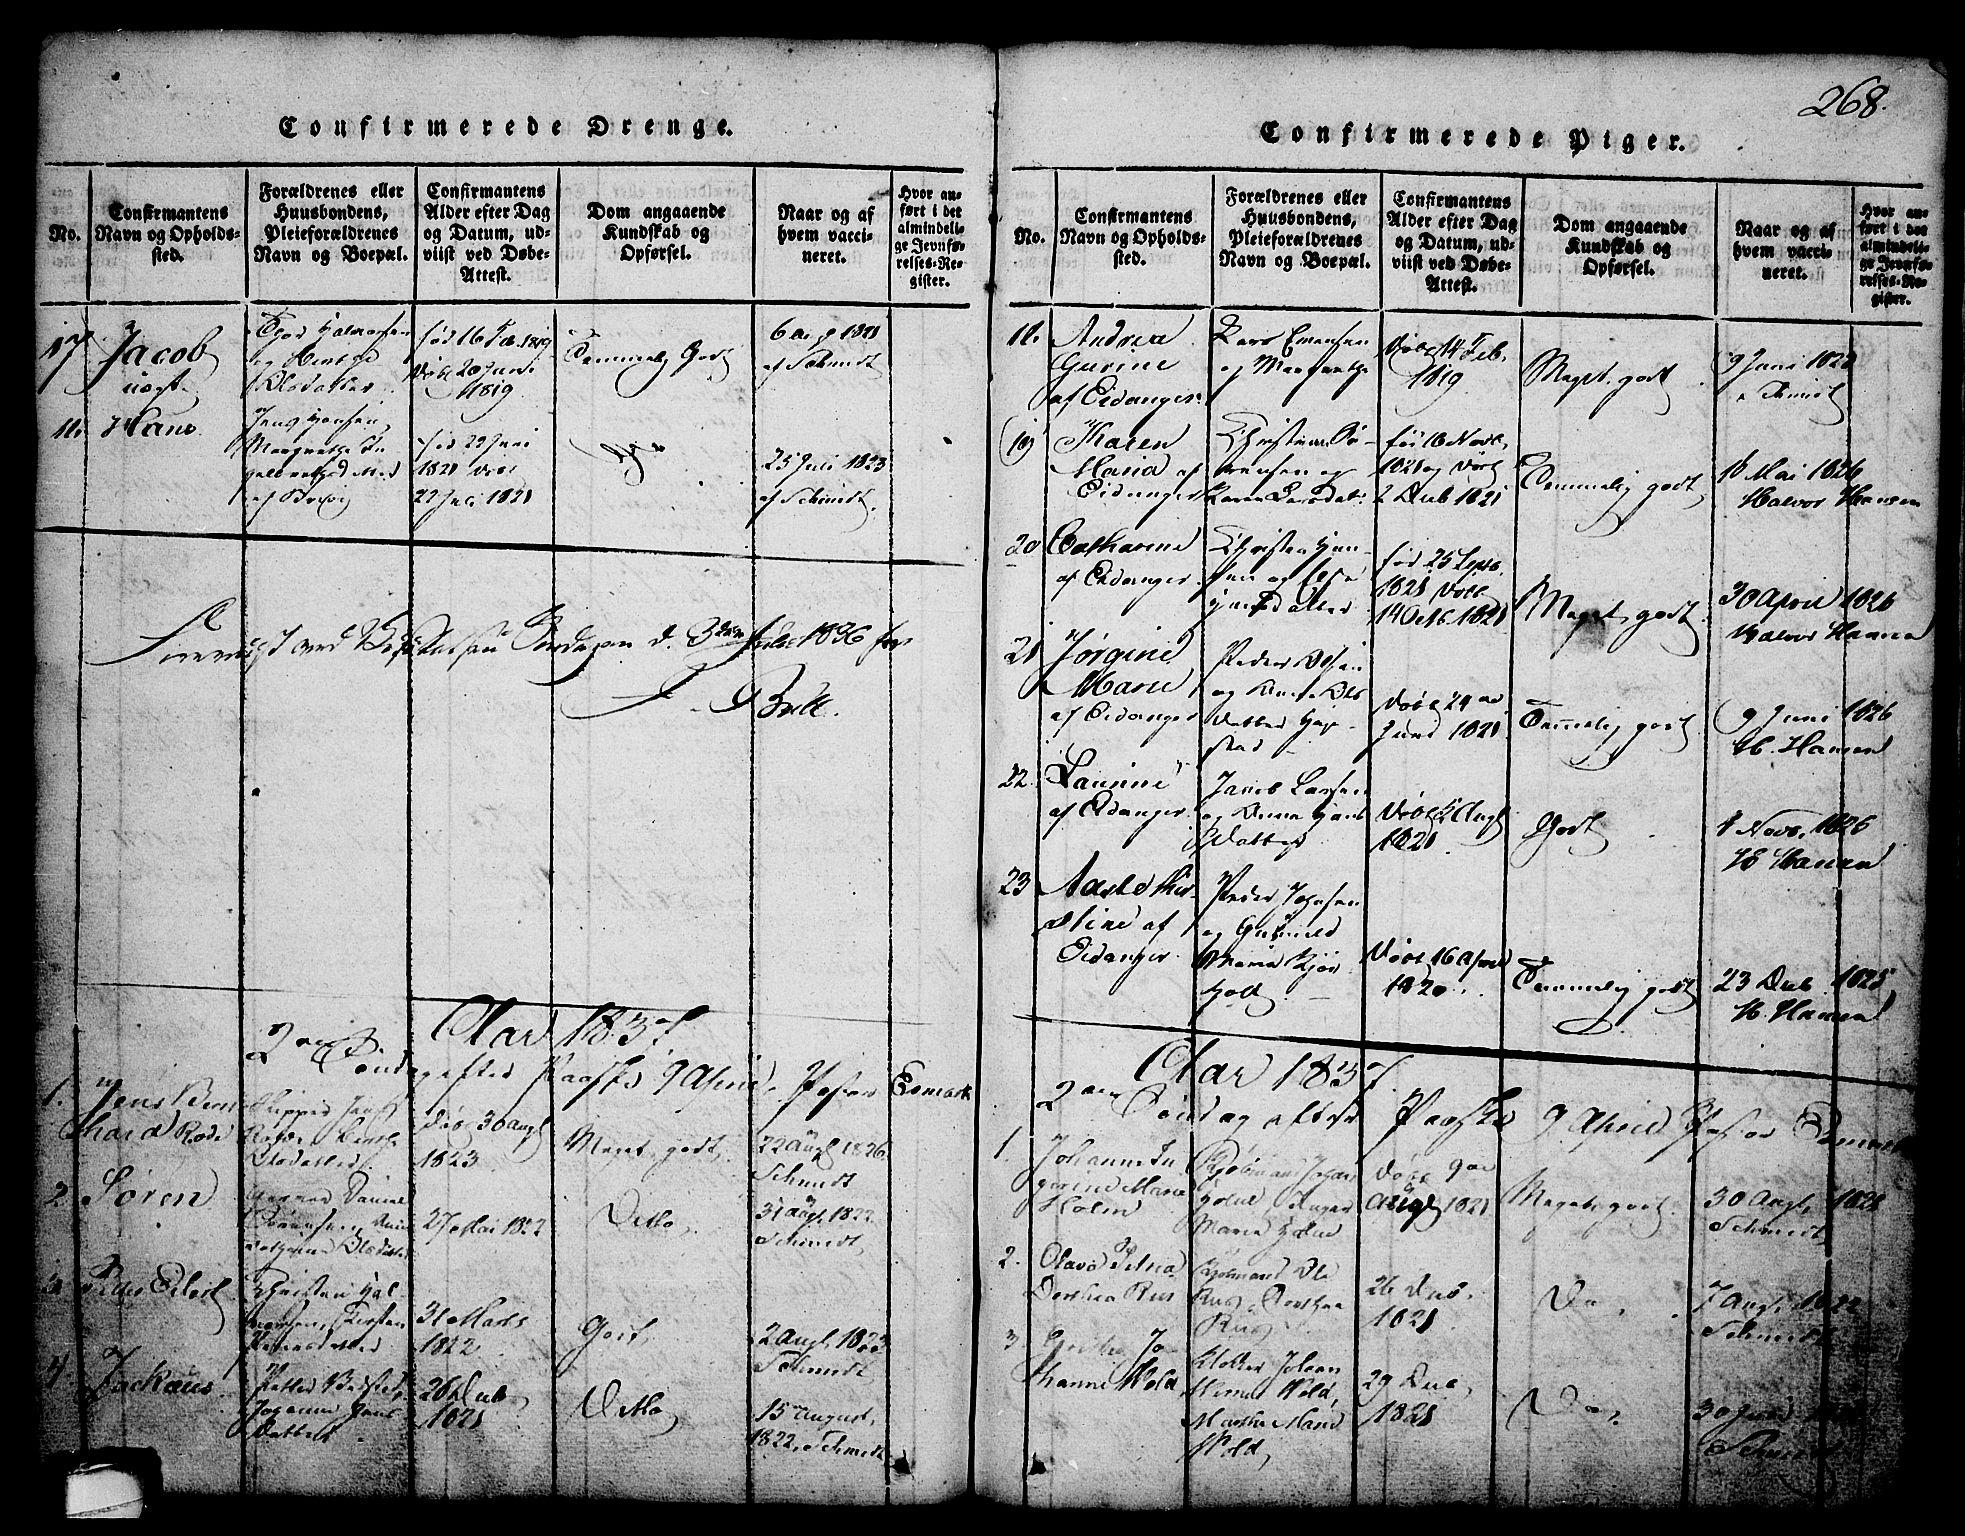 SAKO, Brevik kirkebøker, G/Ga/L0001: Klokkerbok nr. 1, 1814-1845, s. 268